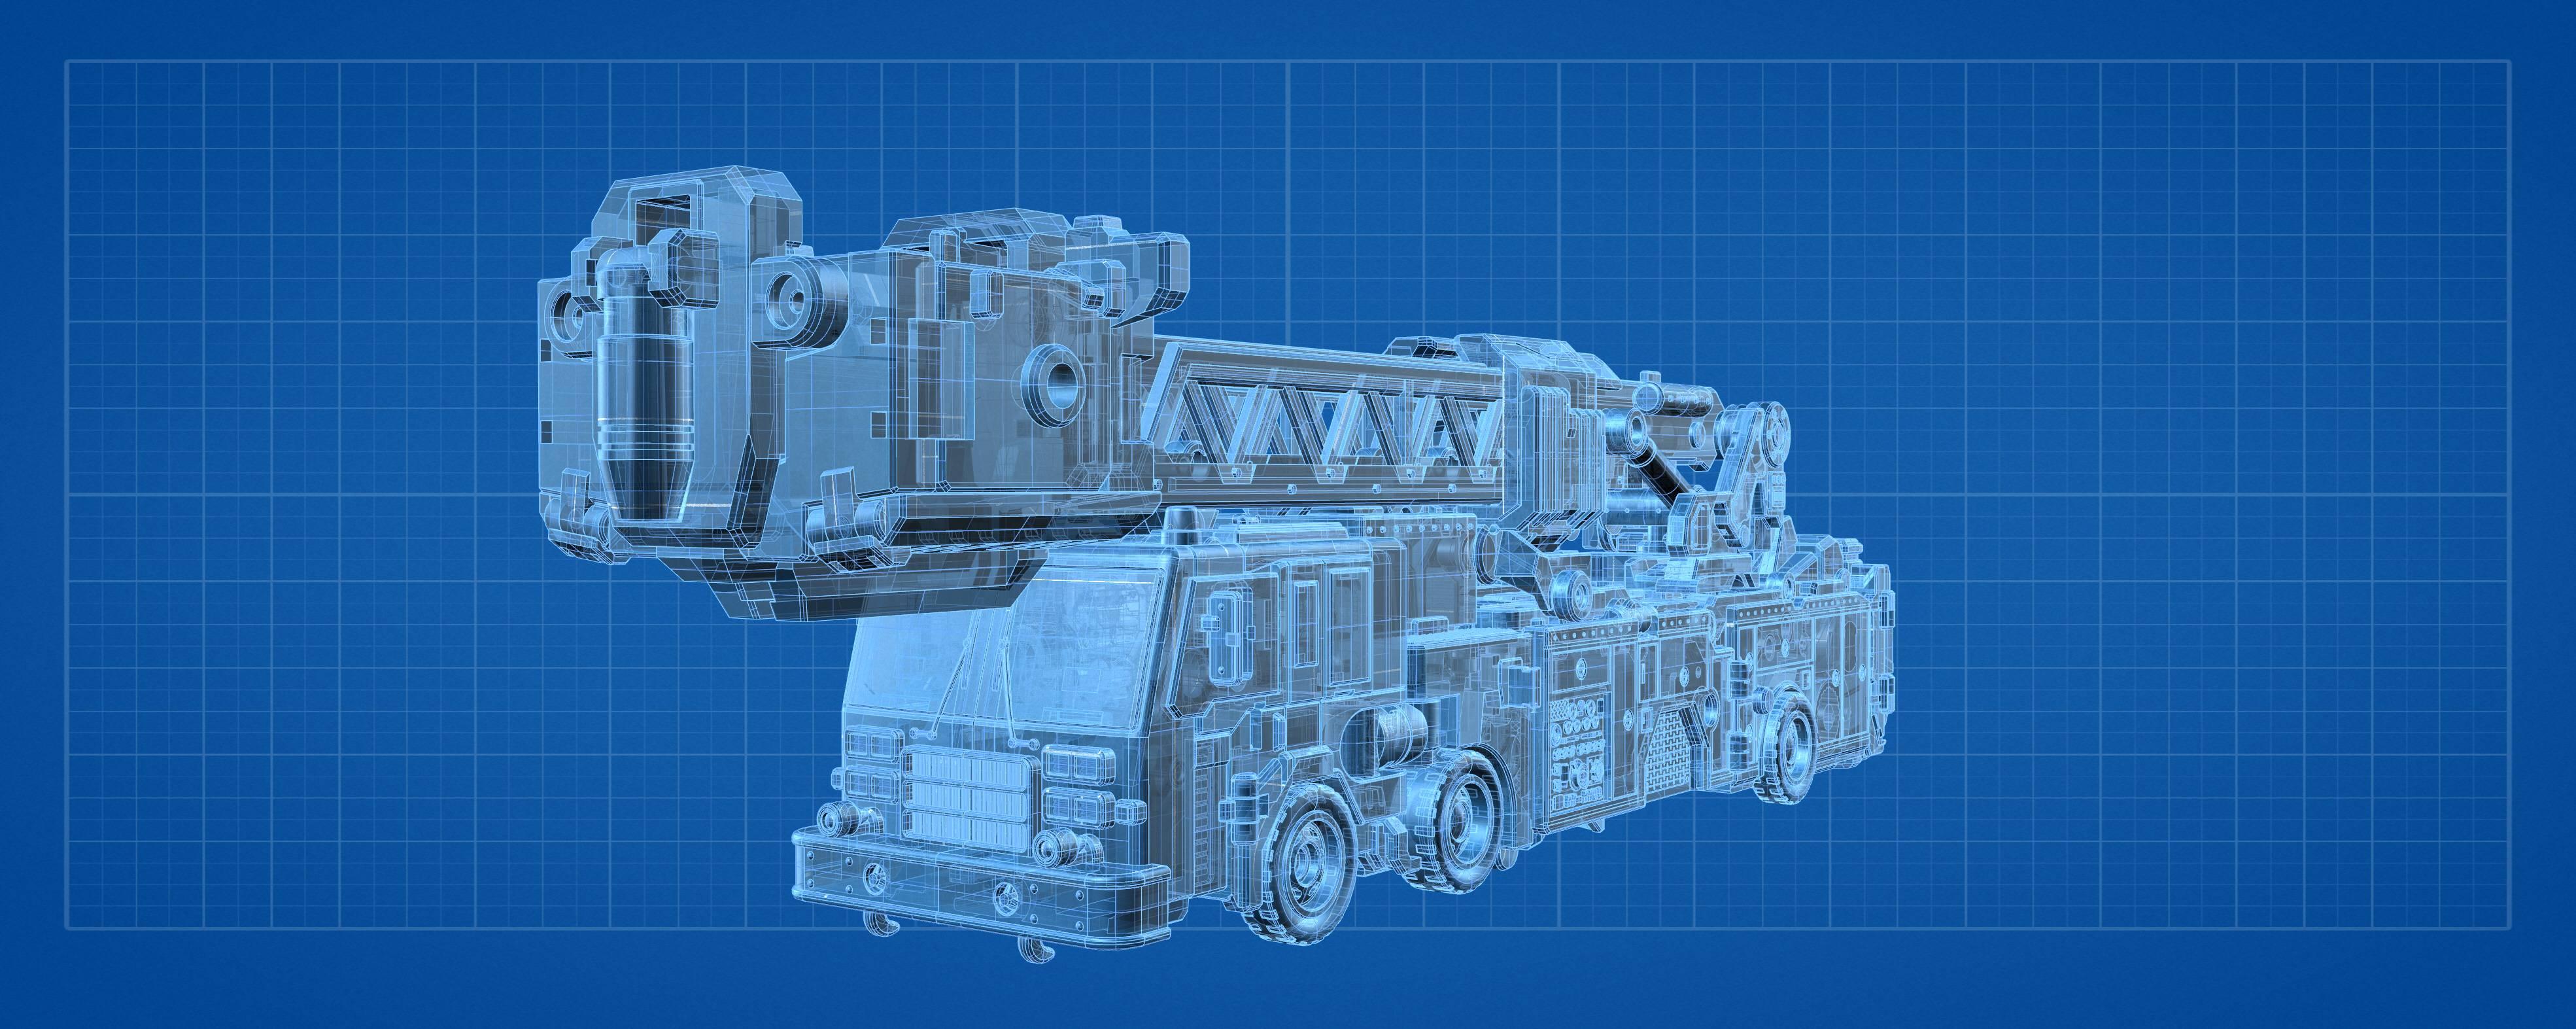 [Ocular Max] Produit Tiers - Maximus Pro (PS-21 à PS-25) - aka Defensor/Défenso HB38UlWU